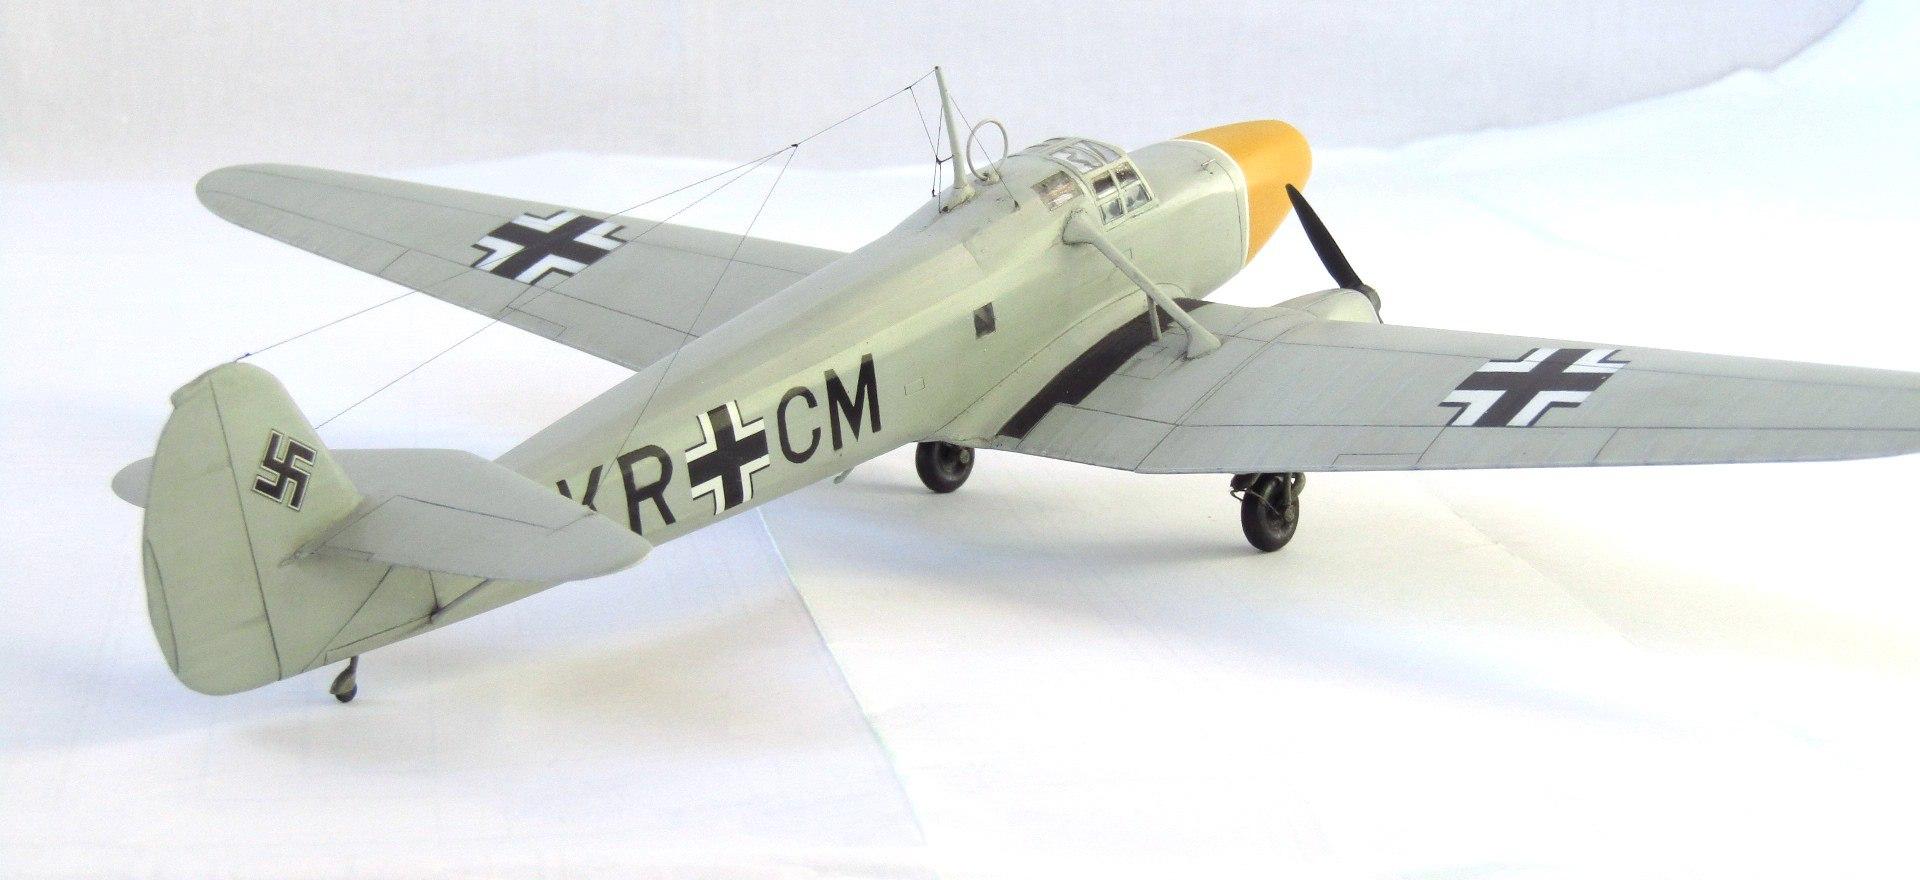 FW - 58C weihe 1/72 (Special Hobby) G3H_GfoIPP8